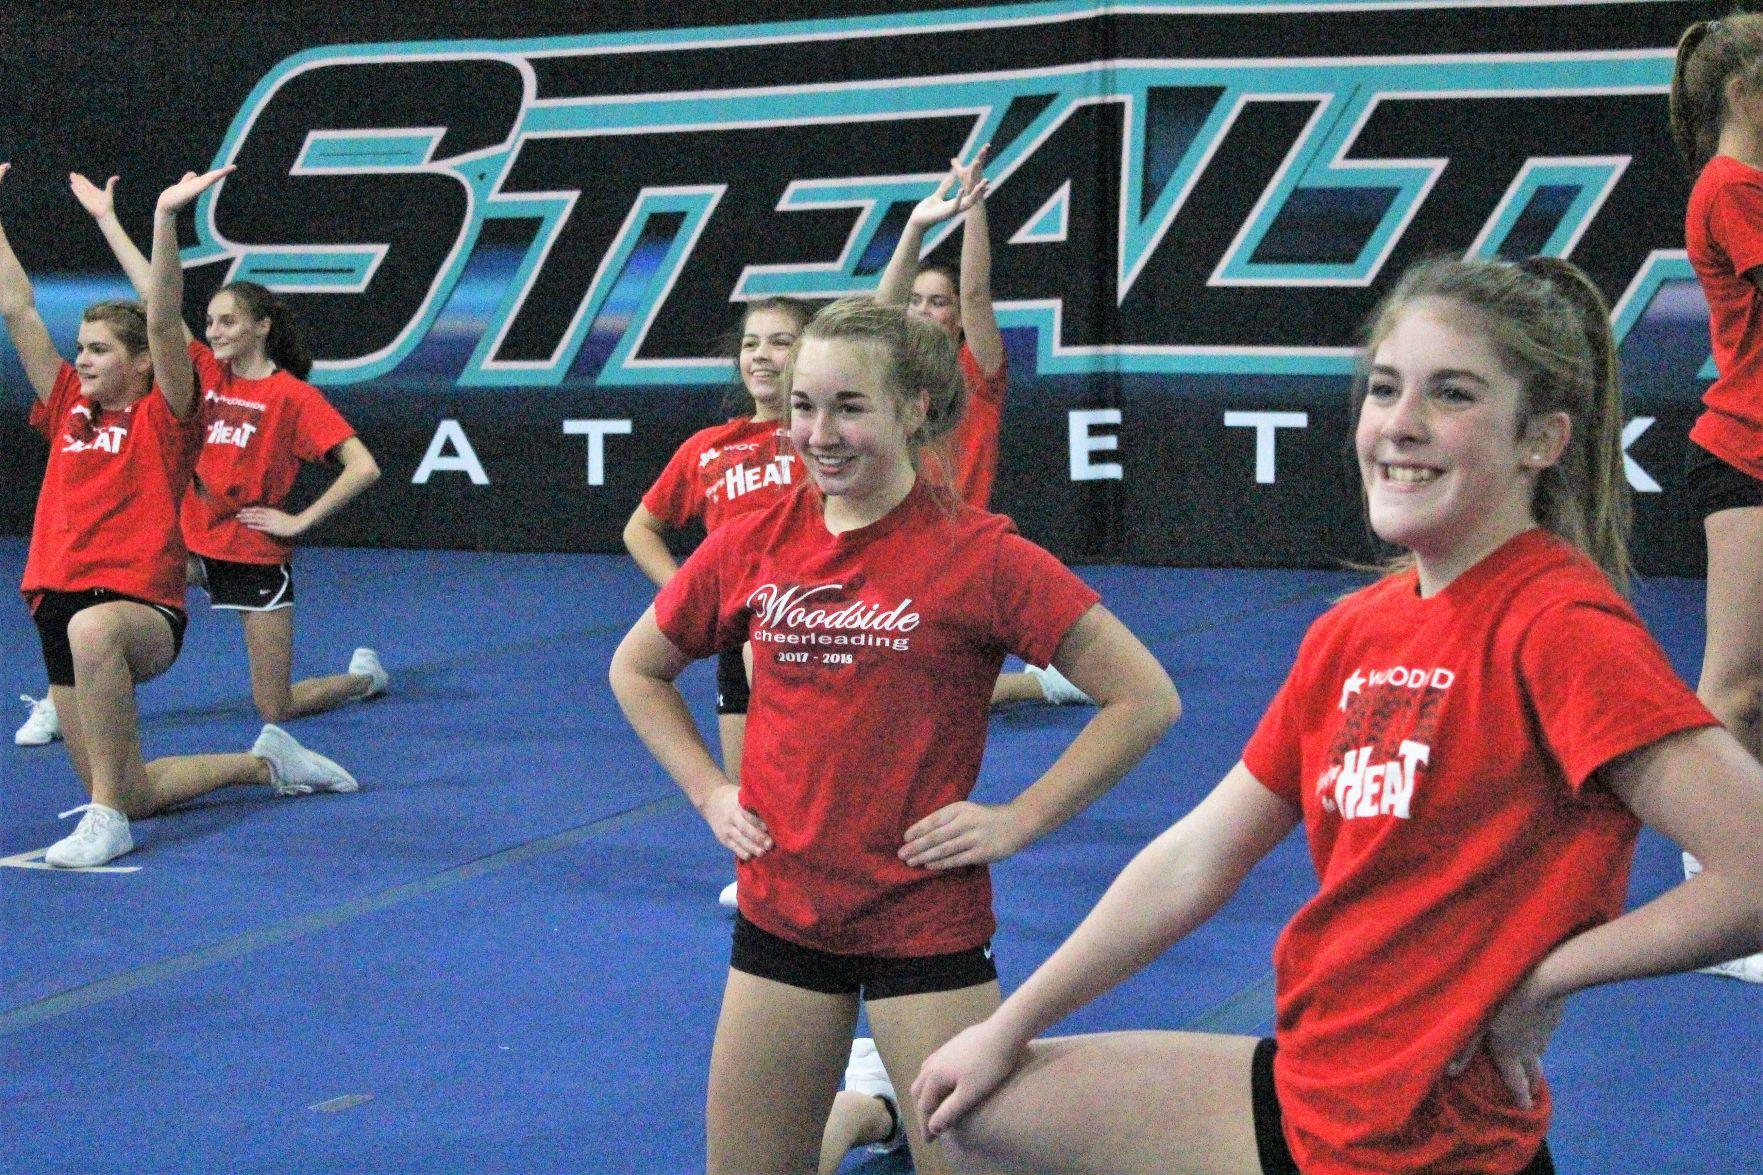 Youth Running Shorts Jocelynn Girl Cheer Practice Shorts